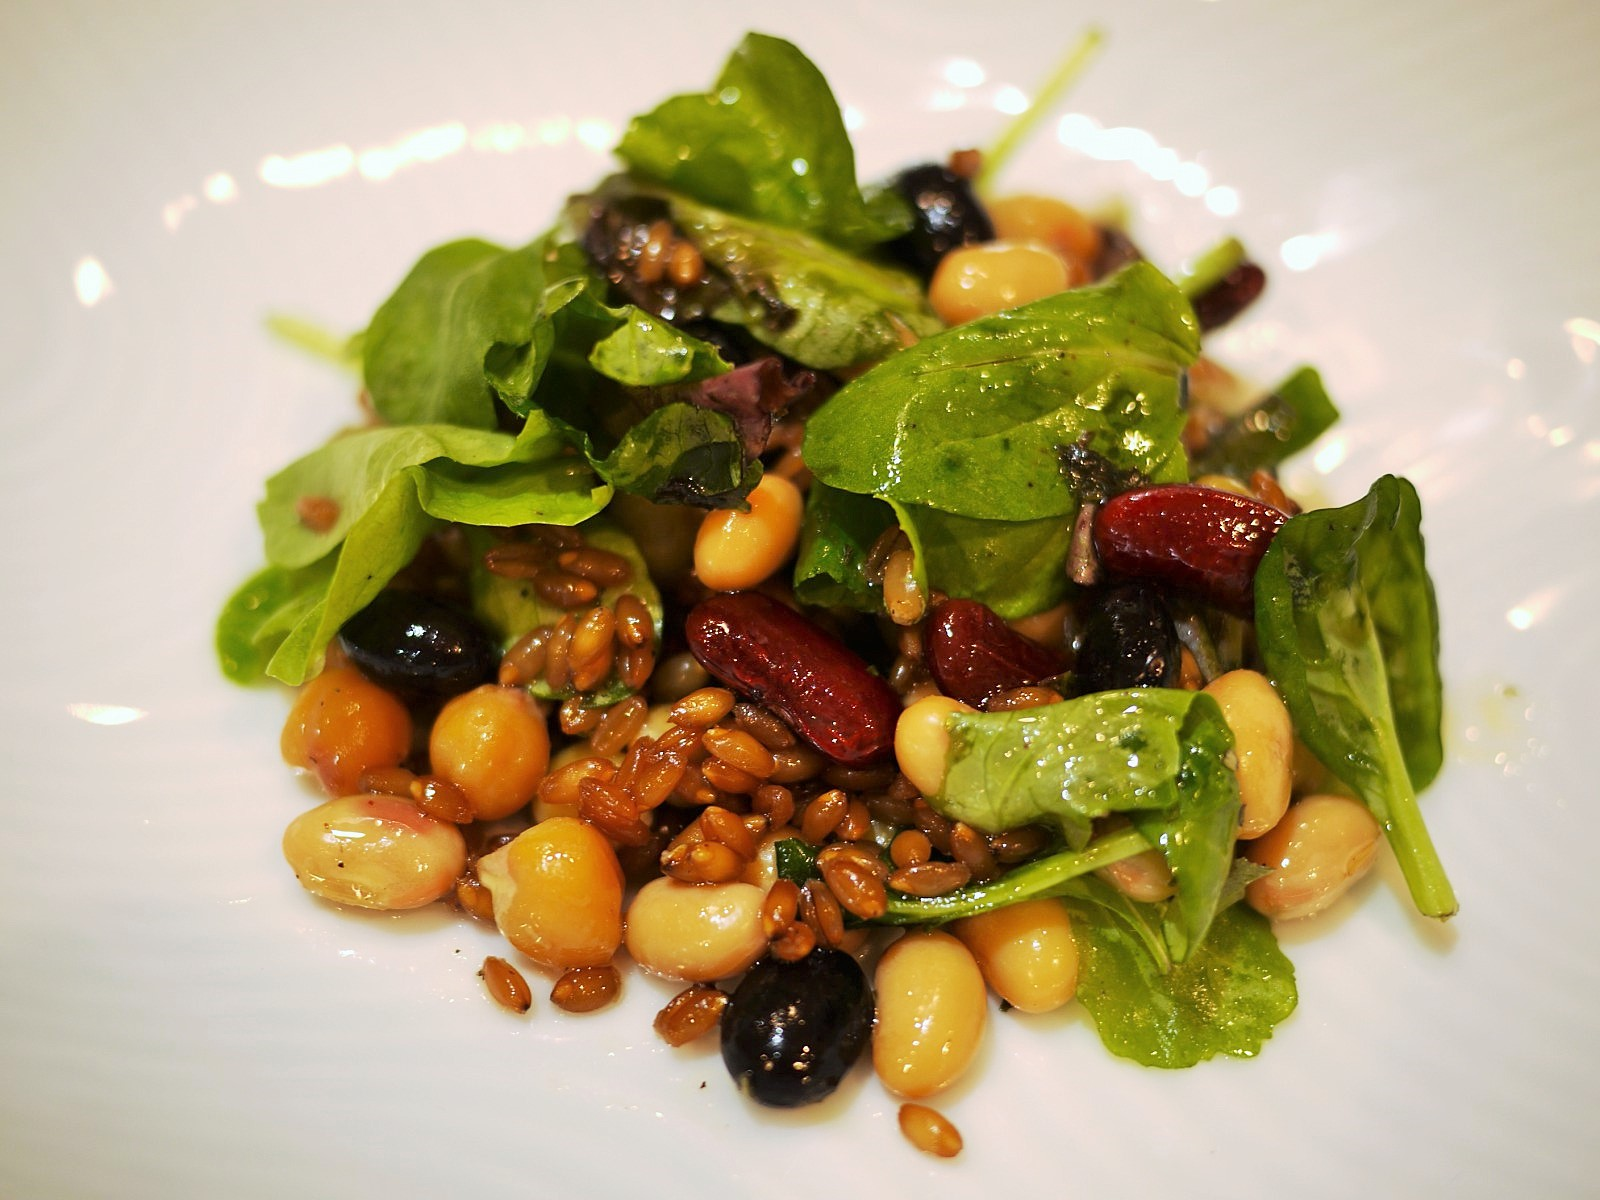 s_salad (2).JPG